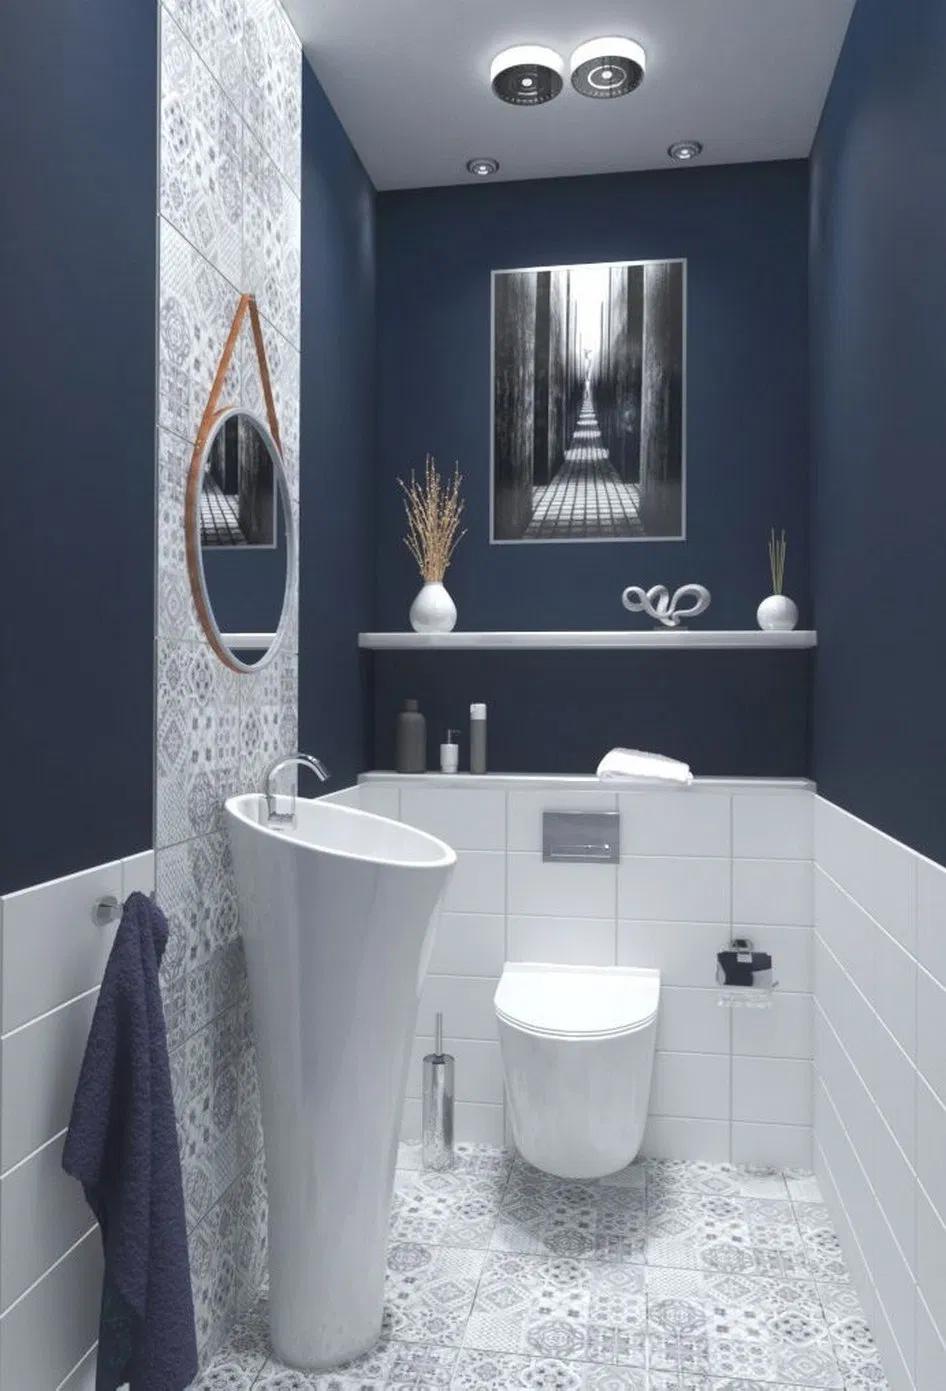 Photo of 15 small bathroom designs and ideas 8 #bathroomideas #bathroomdesign #bathroomdecor » helpwritingessays.net #badeværelseinspiration